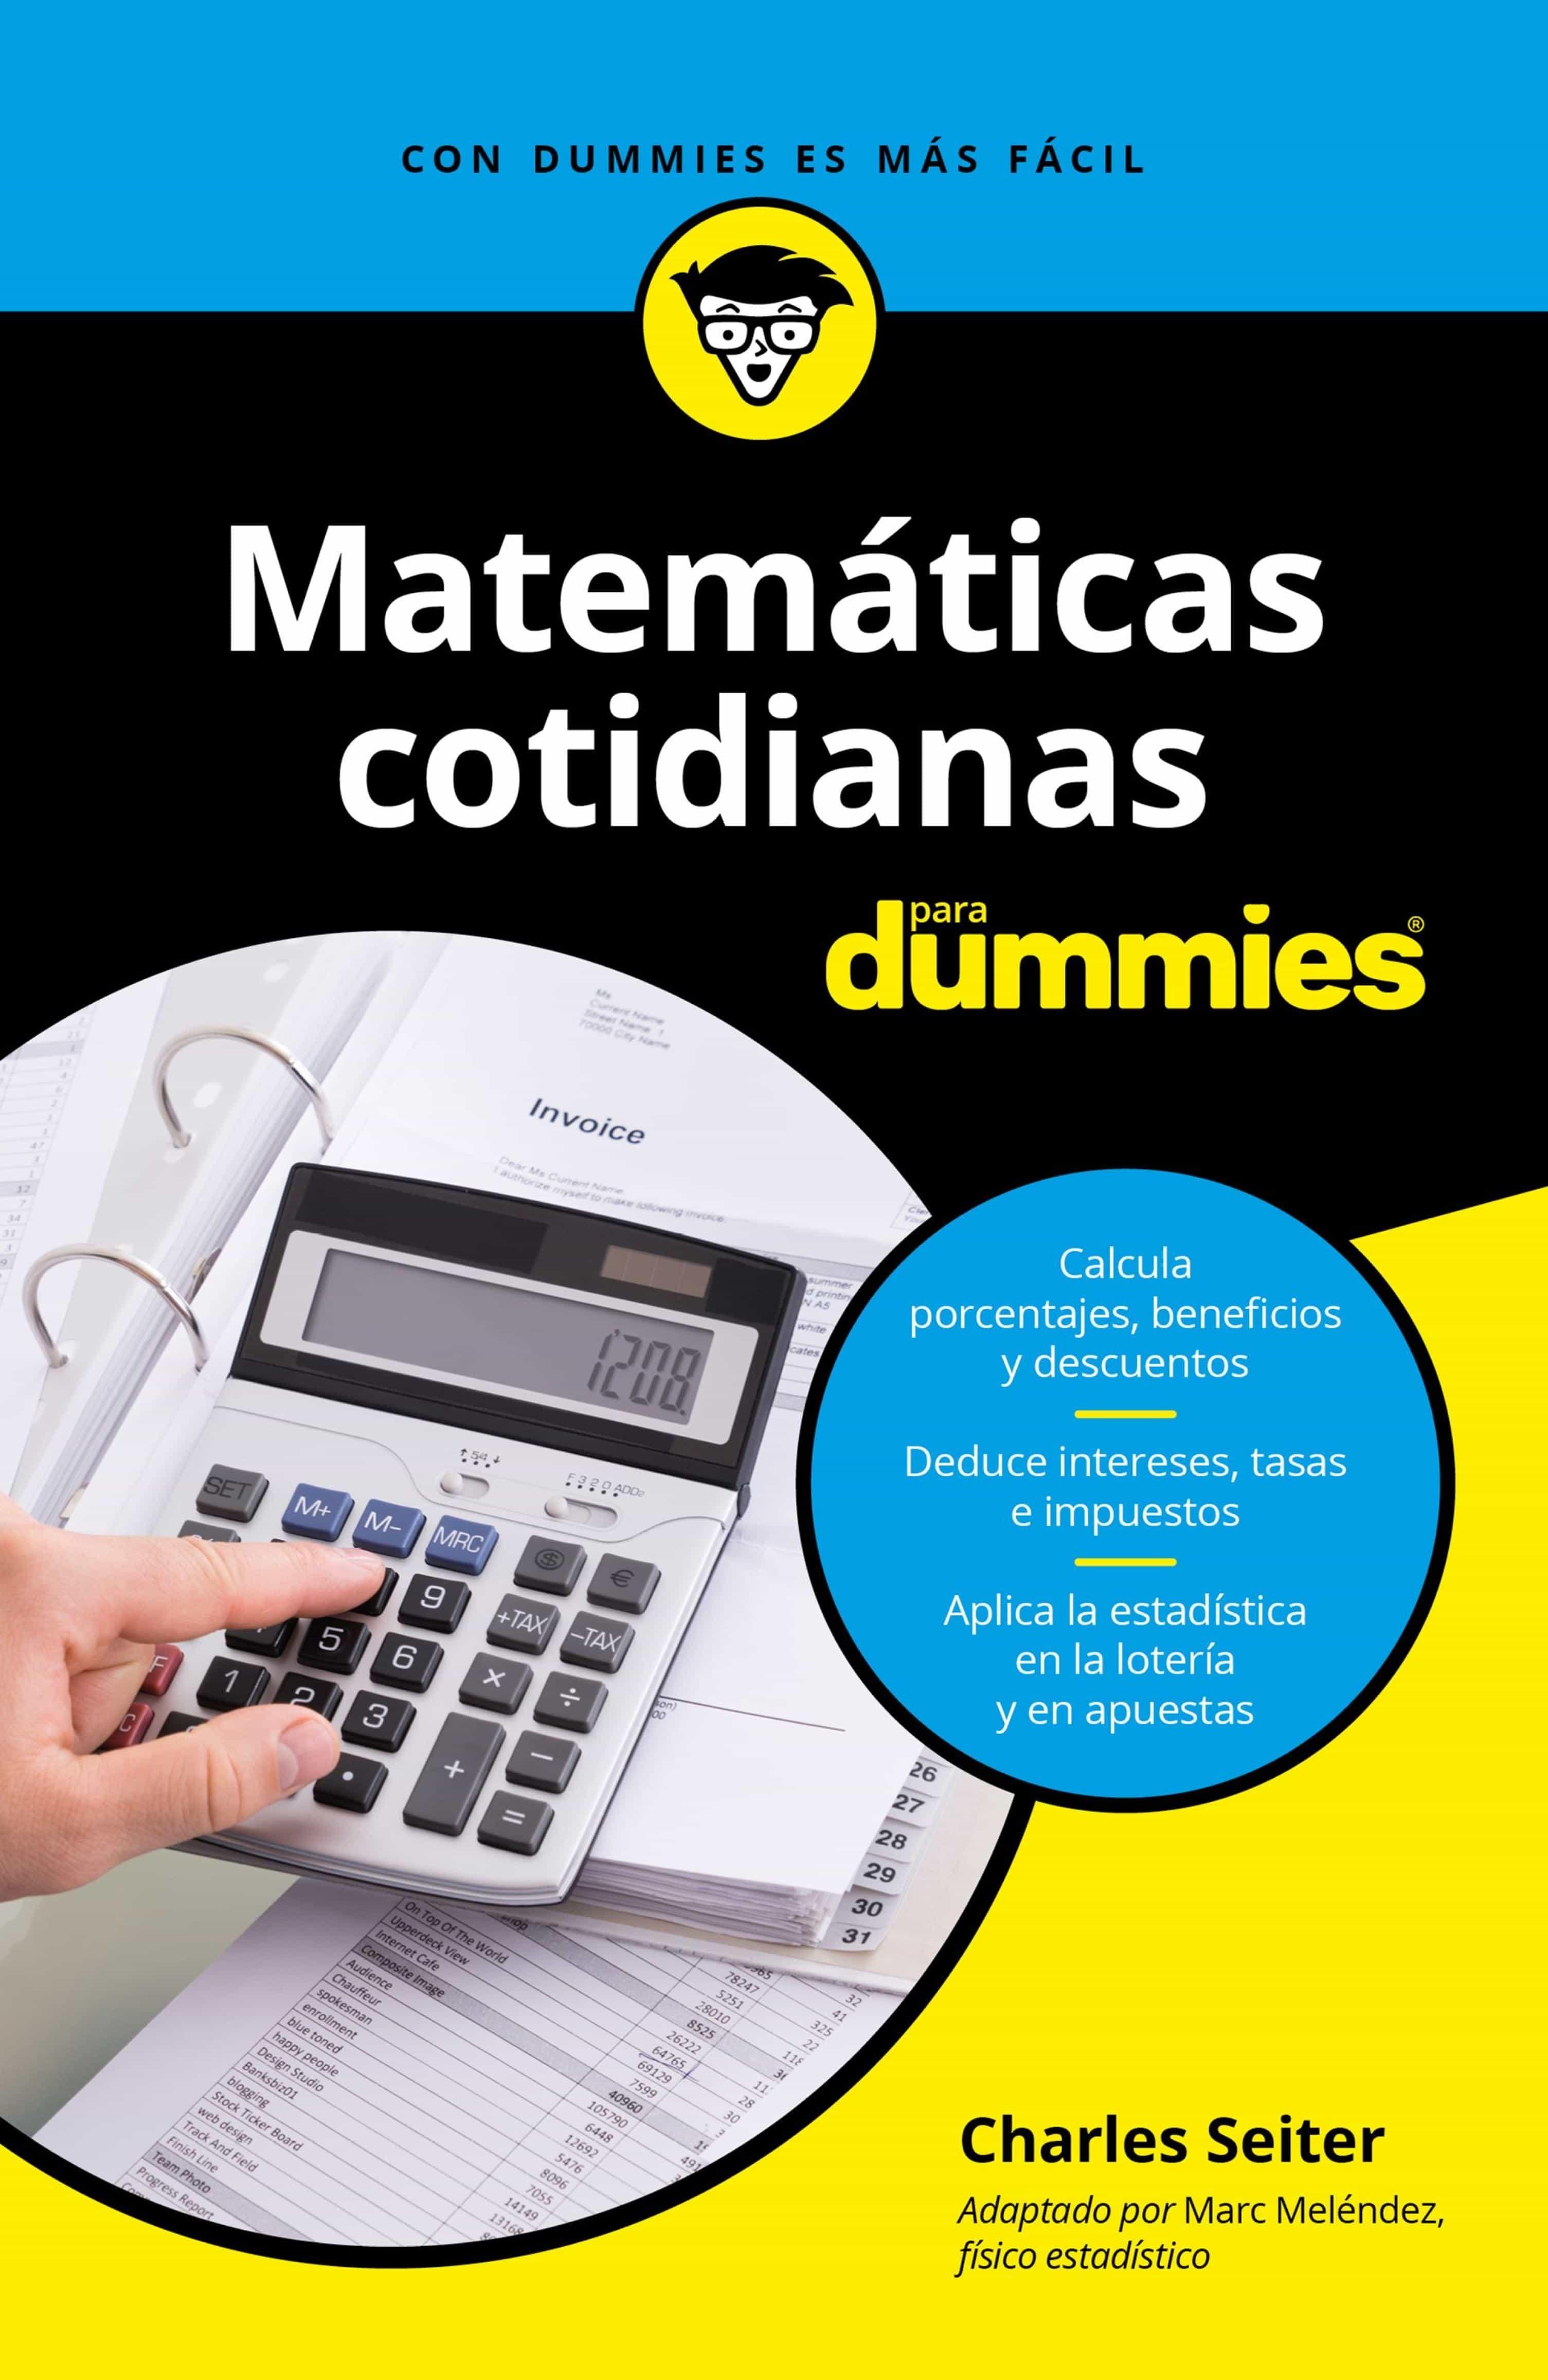 MATEMÁTICAS COTIDIANAS PARA DUMMIES EBOOK | CHARLES SEITER ...